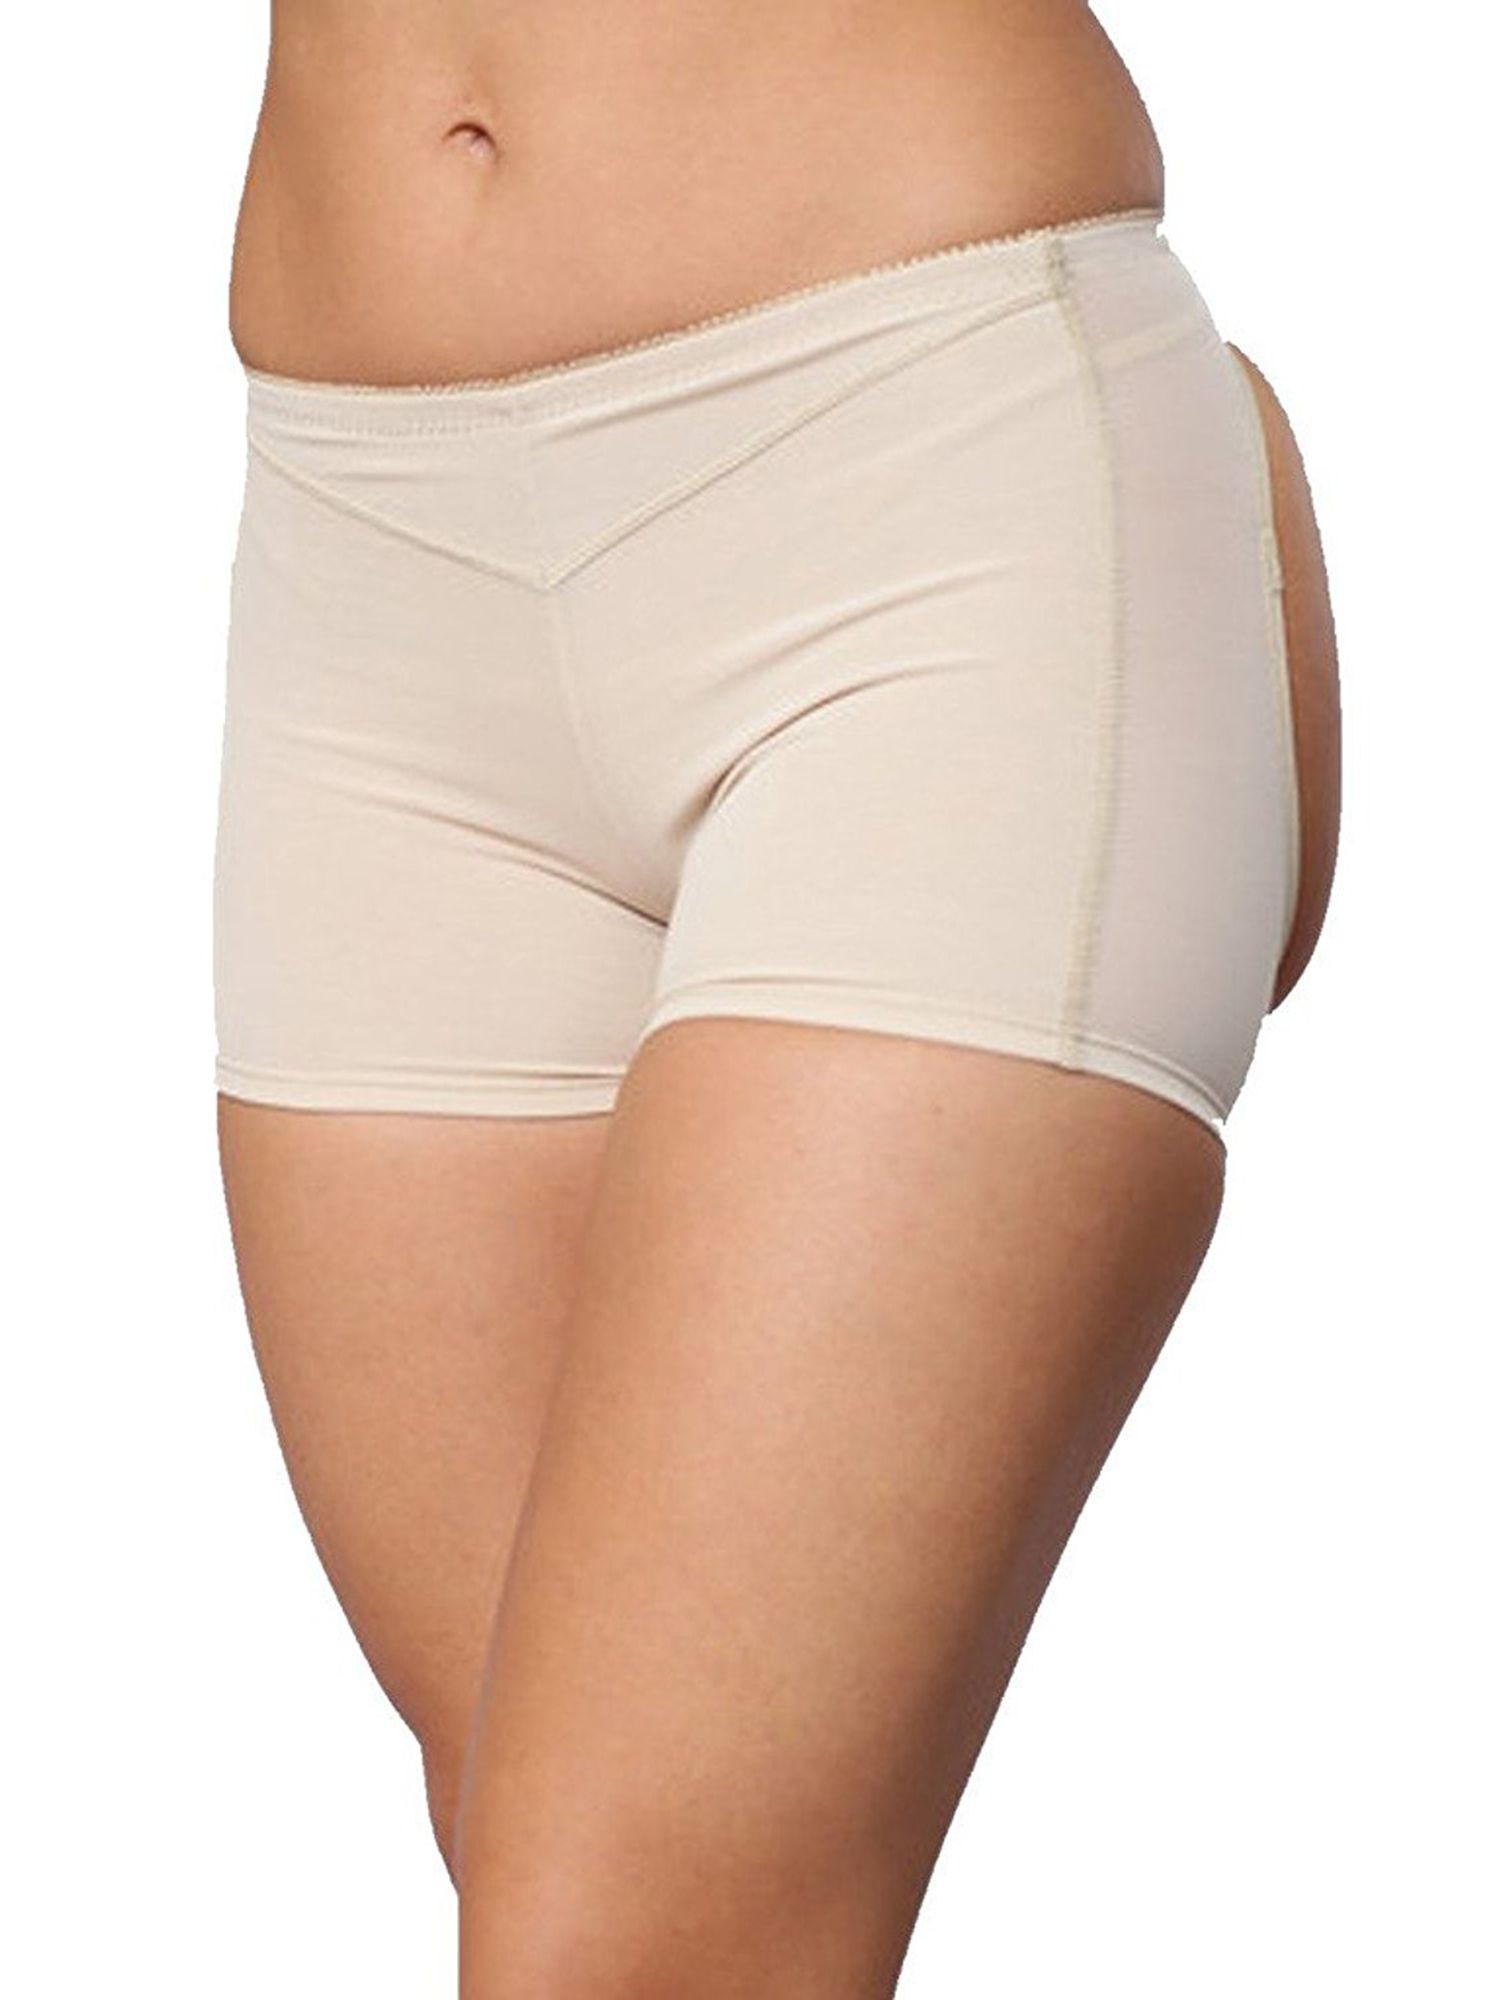 340d9c7a5602 SAYFUT Womens Ultra Firm Control Shapewear Seamless Butt Lifter Boyshorts  Tummy Waist Trainer Shaper Panties Plus Size S-3XL#Shapewear, #Control,  #Butt